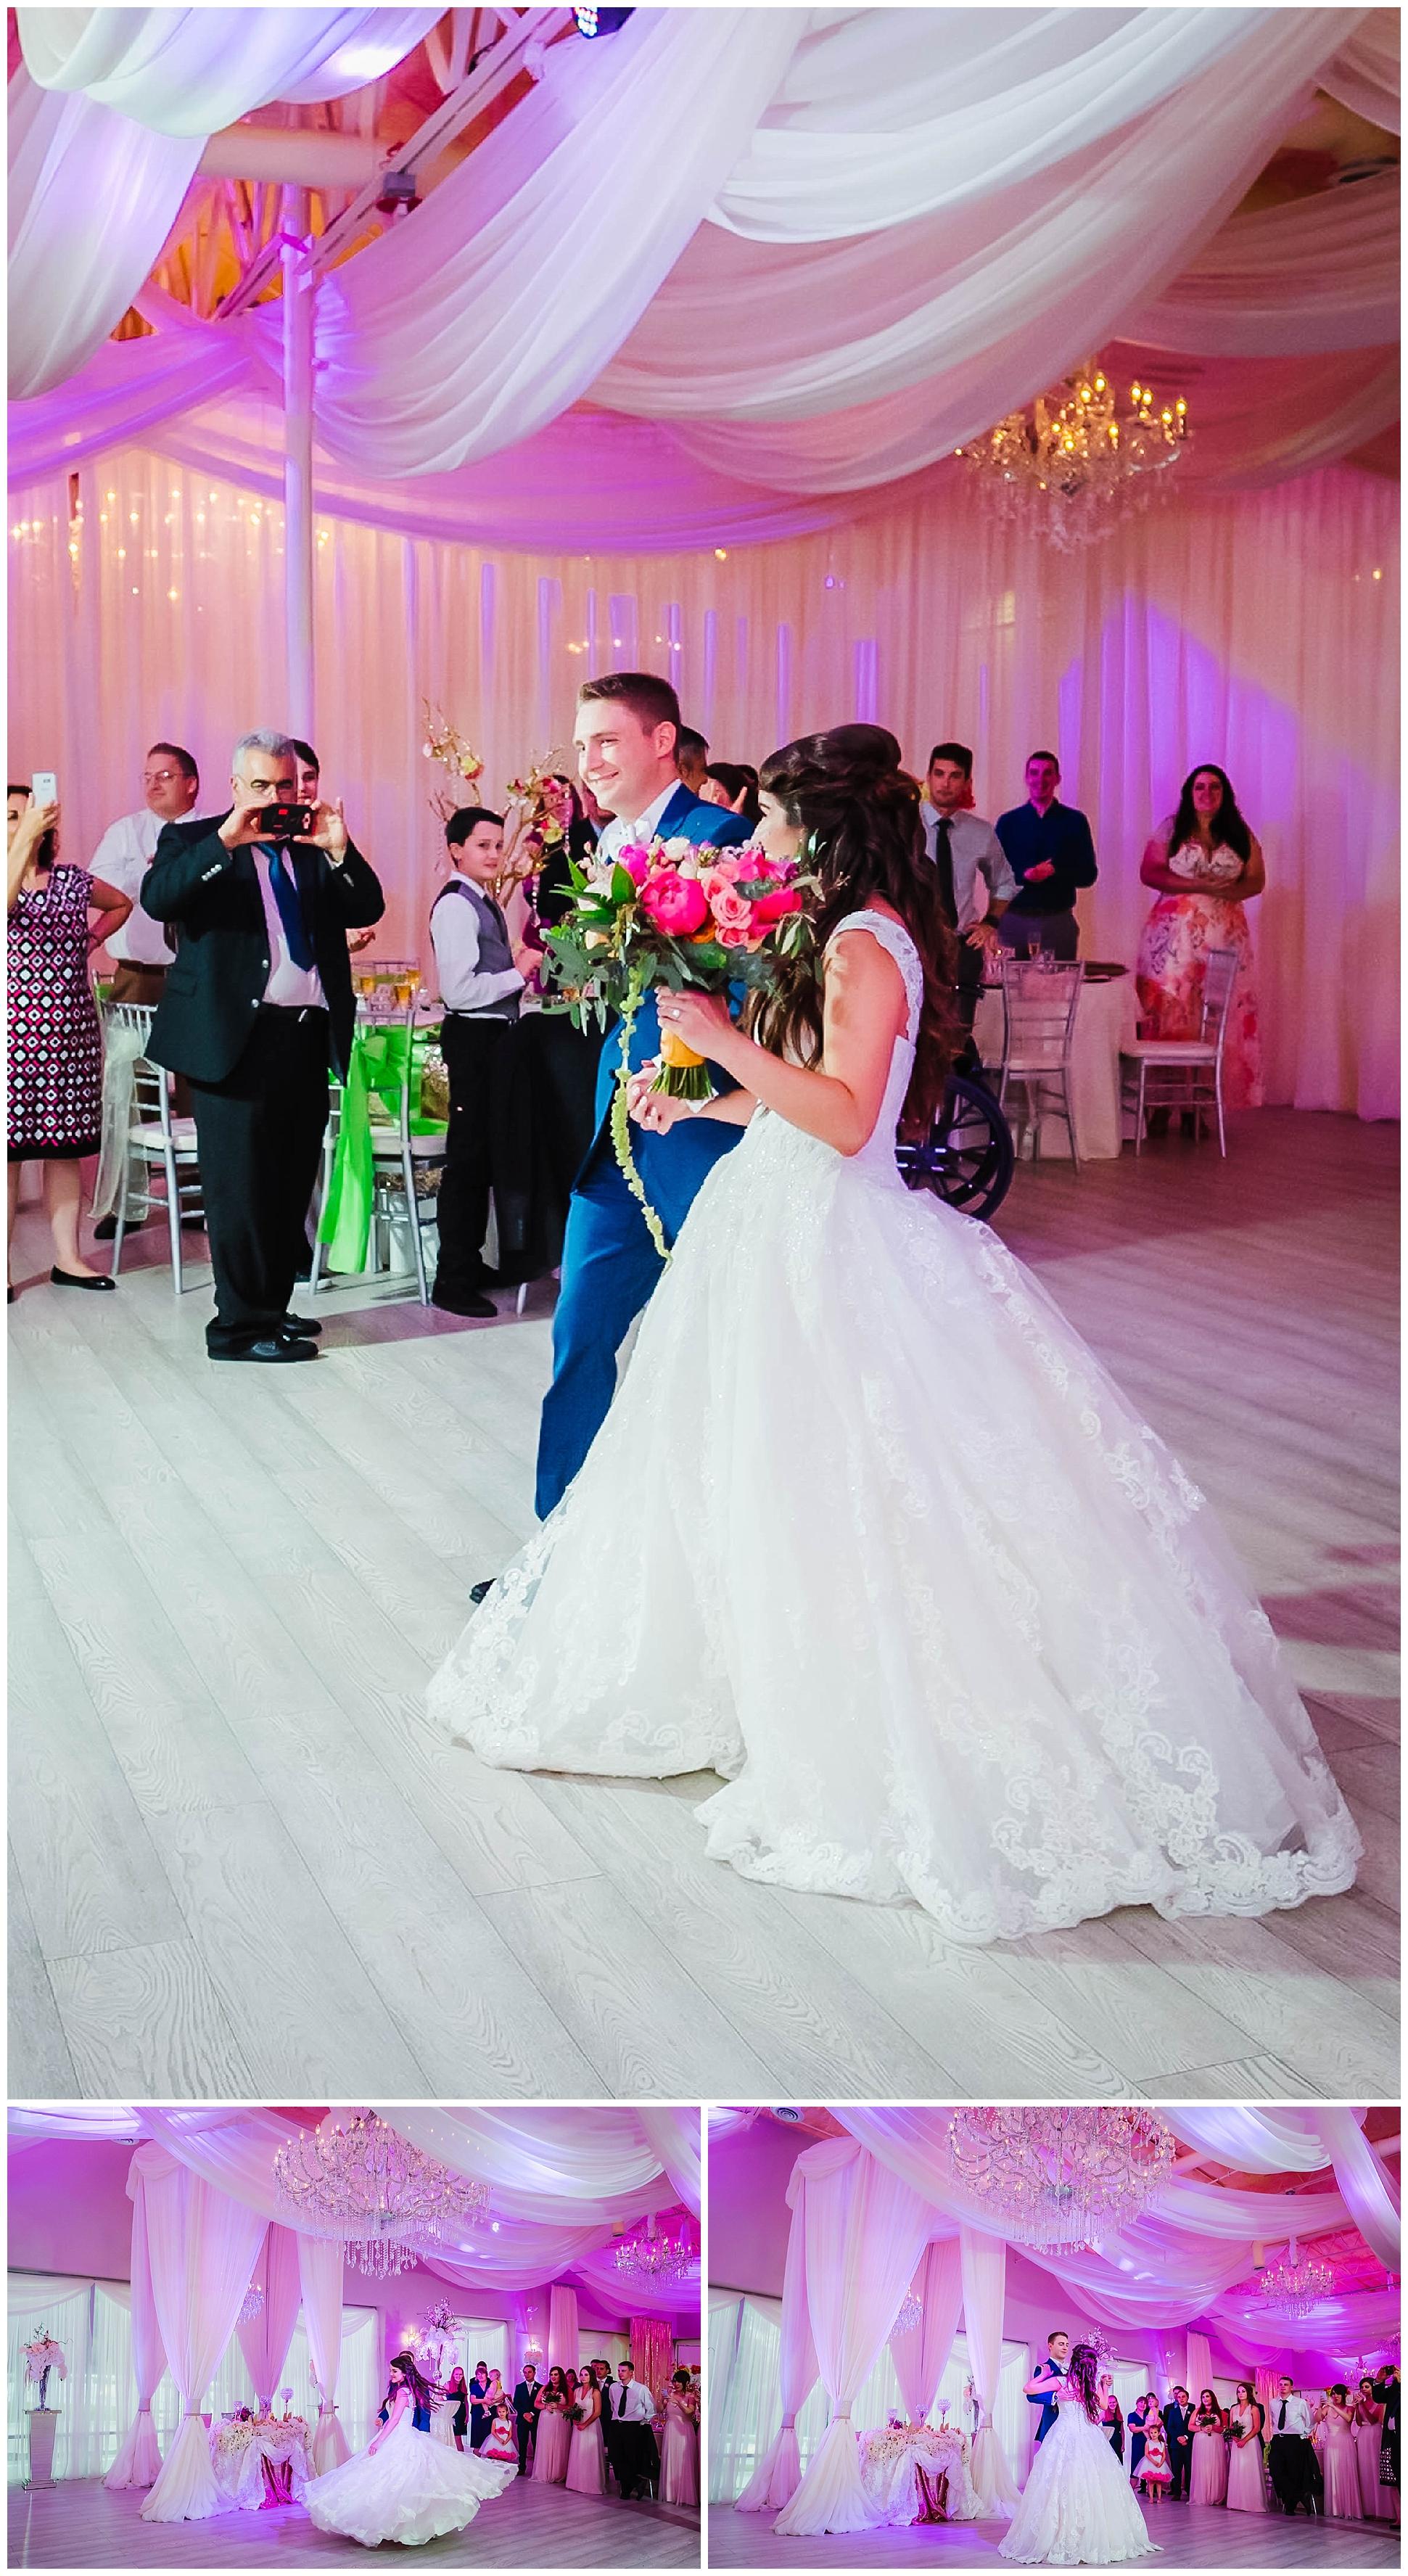 st-pete-wedding-photographer-sunken-gardens-crystal-ballroom-princess-dancer_0187.jpg